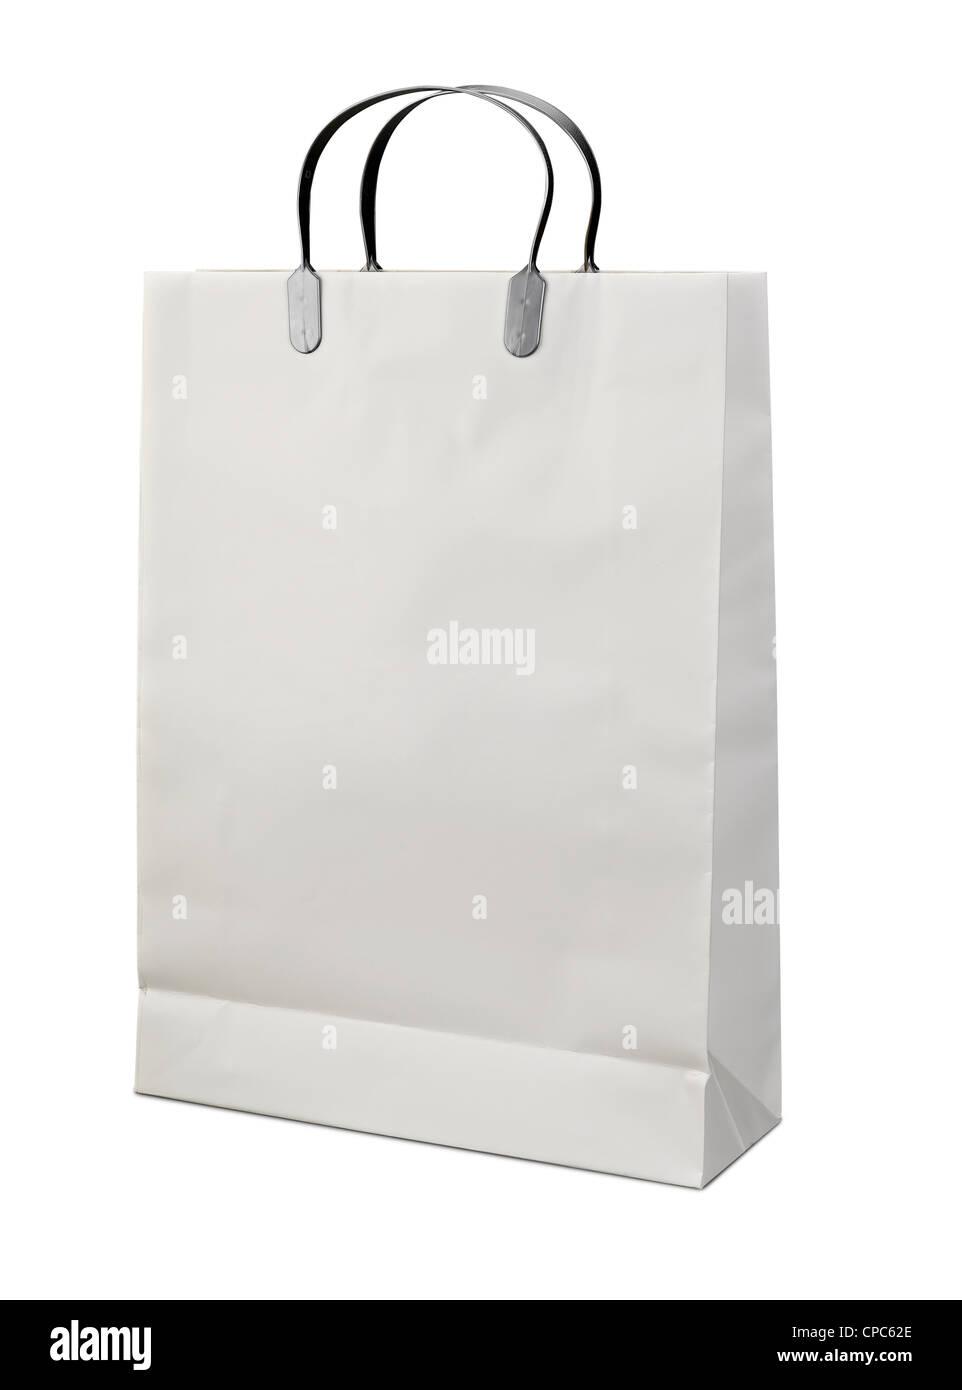 d80bf17869 Shopping Bag Stock Photos & Shopping Bag Stock Images - Alamy